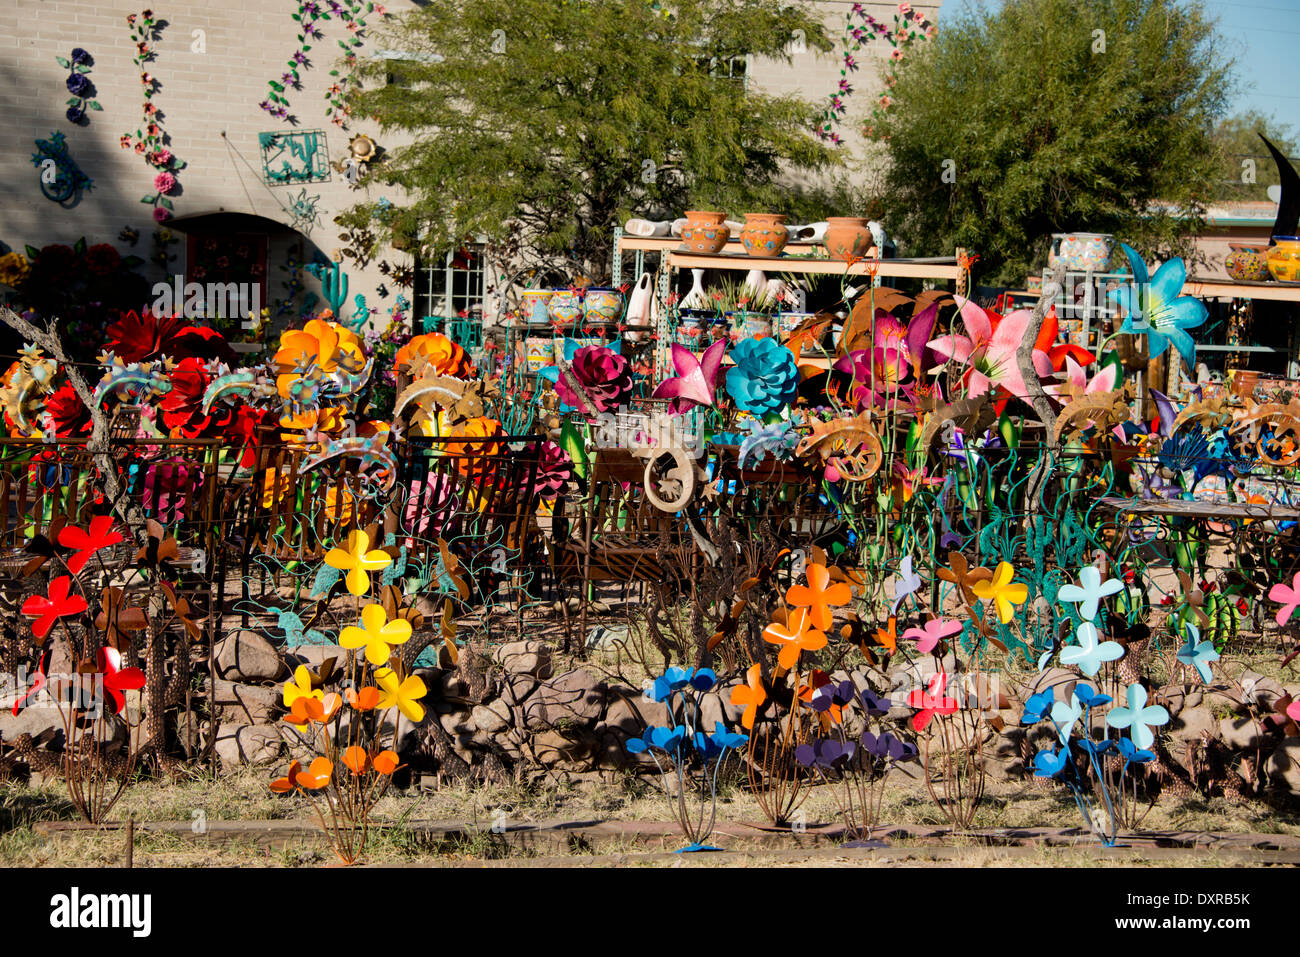 Arizona, Tucson, Tubac  Colorful metal yard and garden sculpture